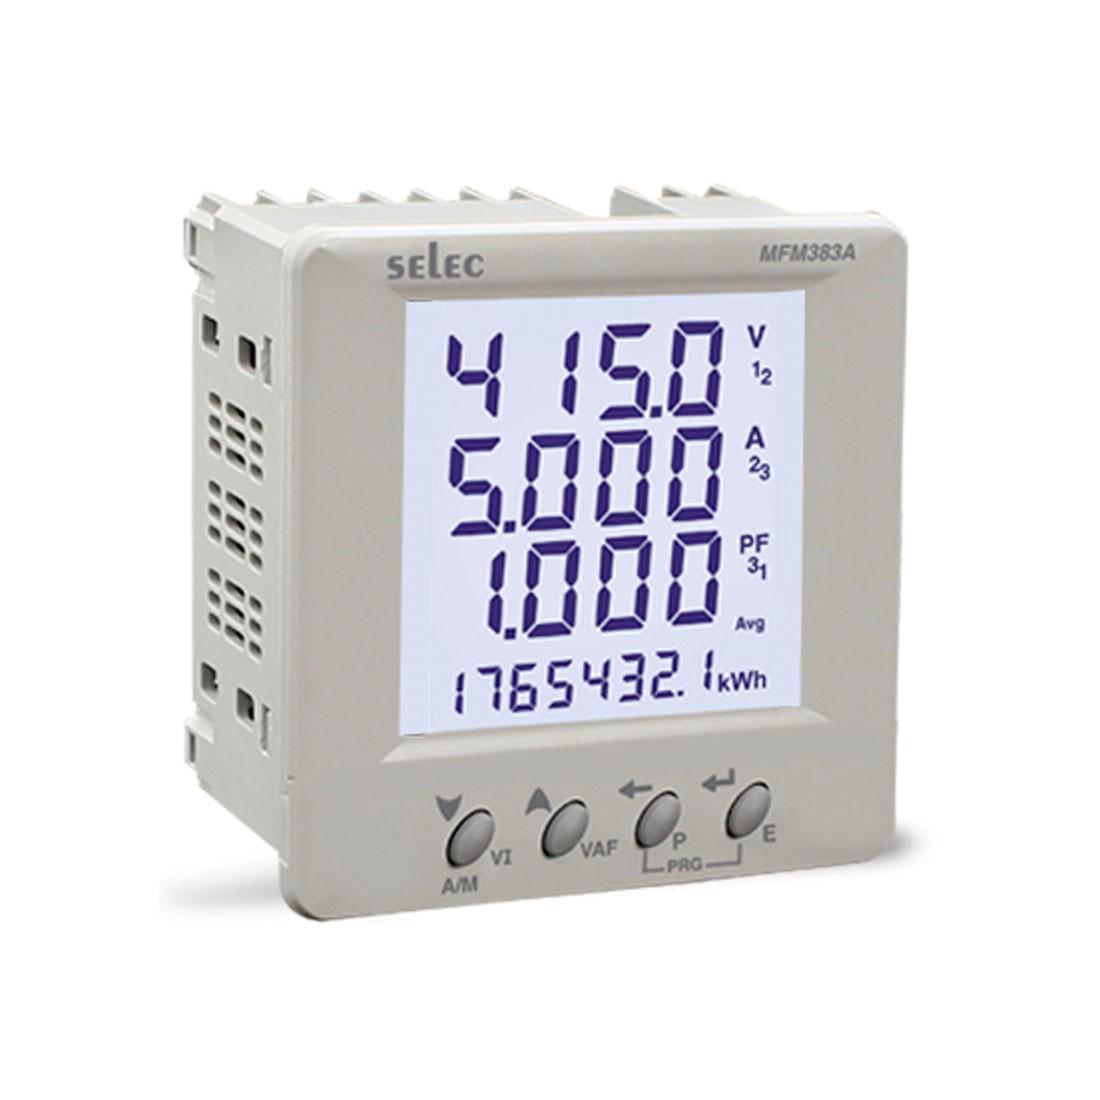 Selec MFM383A Multifunction Power Meter